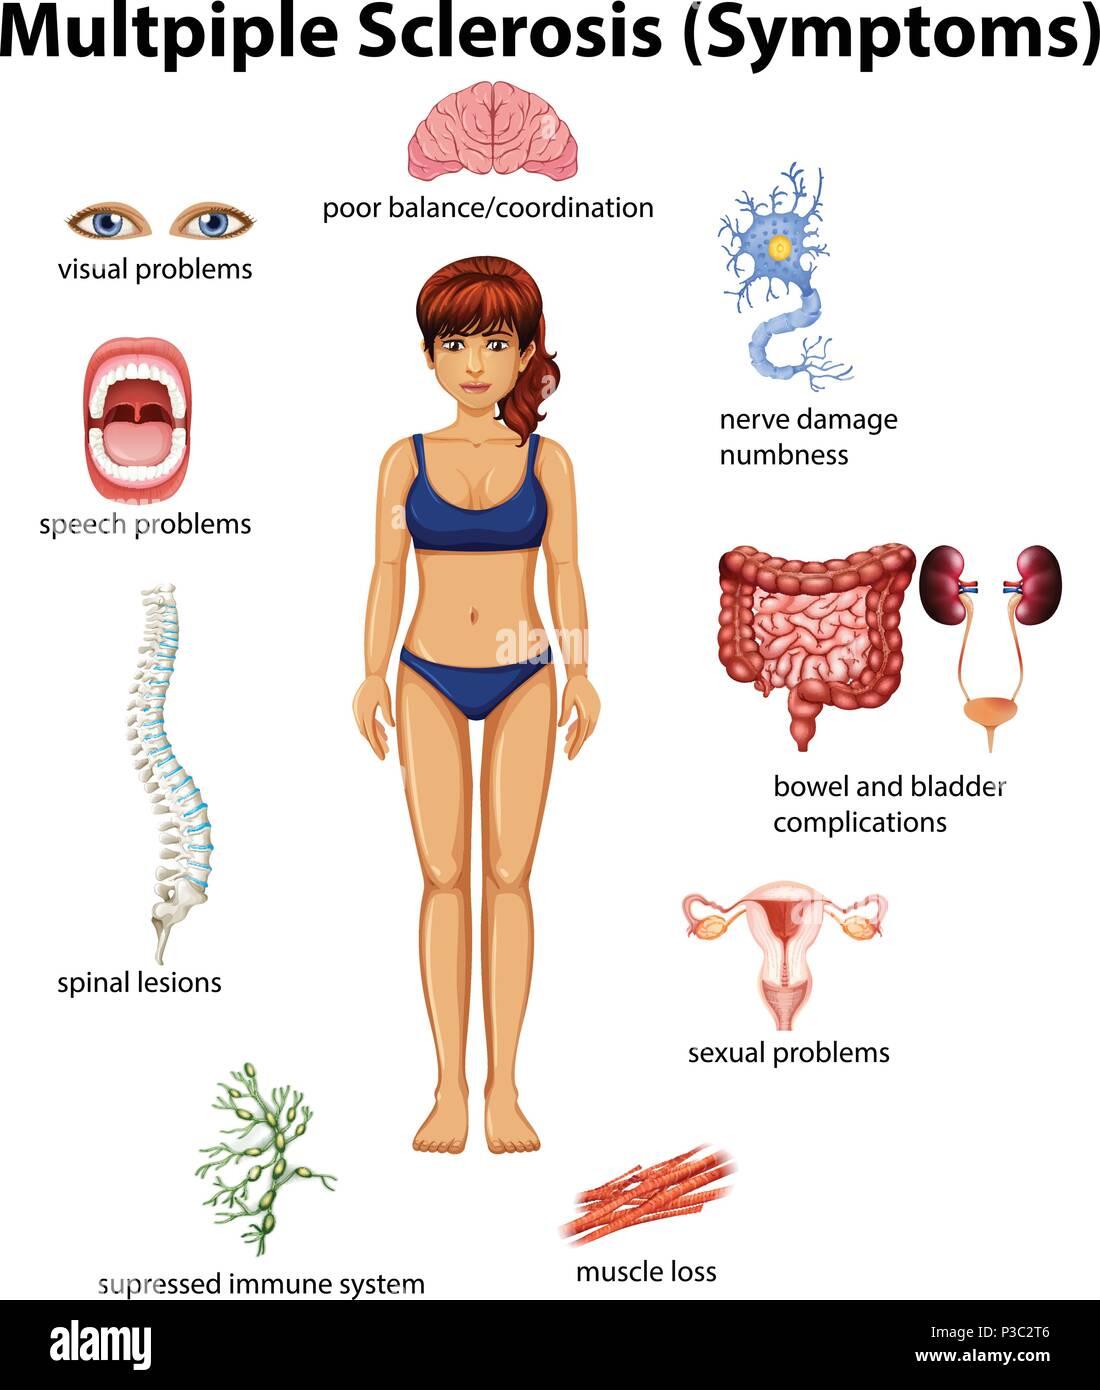 Multiple Sclerosis Illustration Stock Photos & Multiple